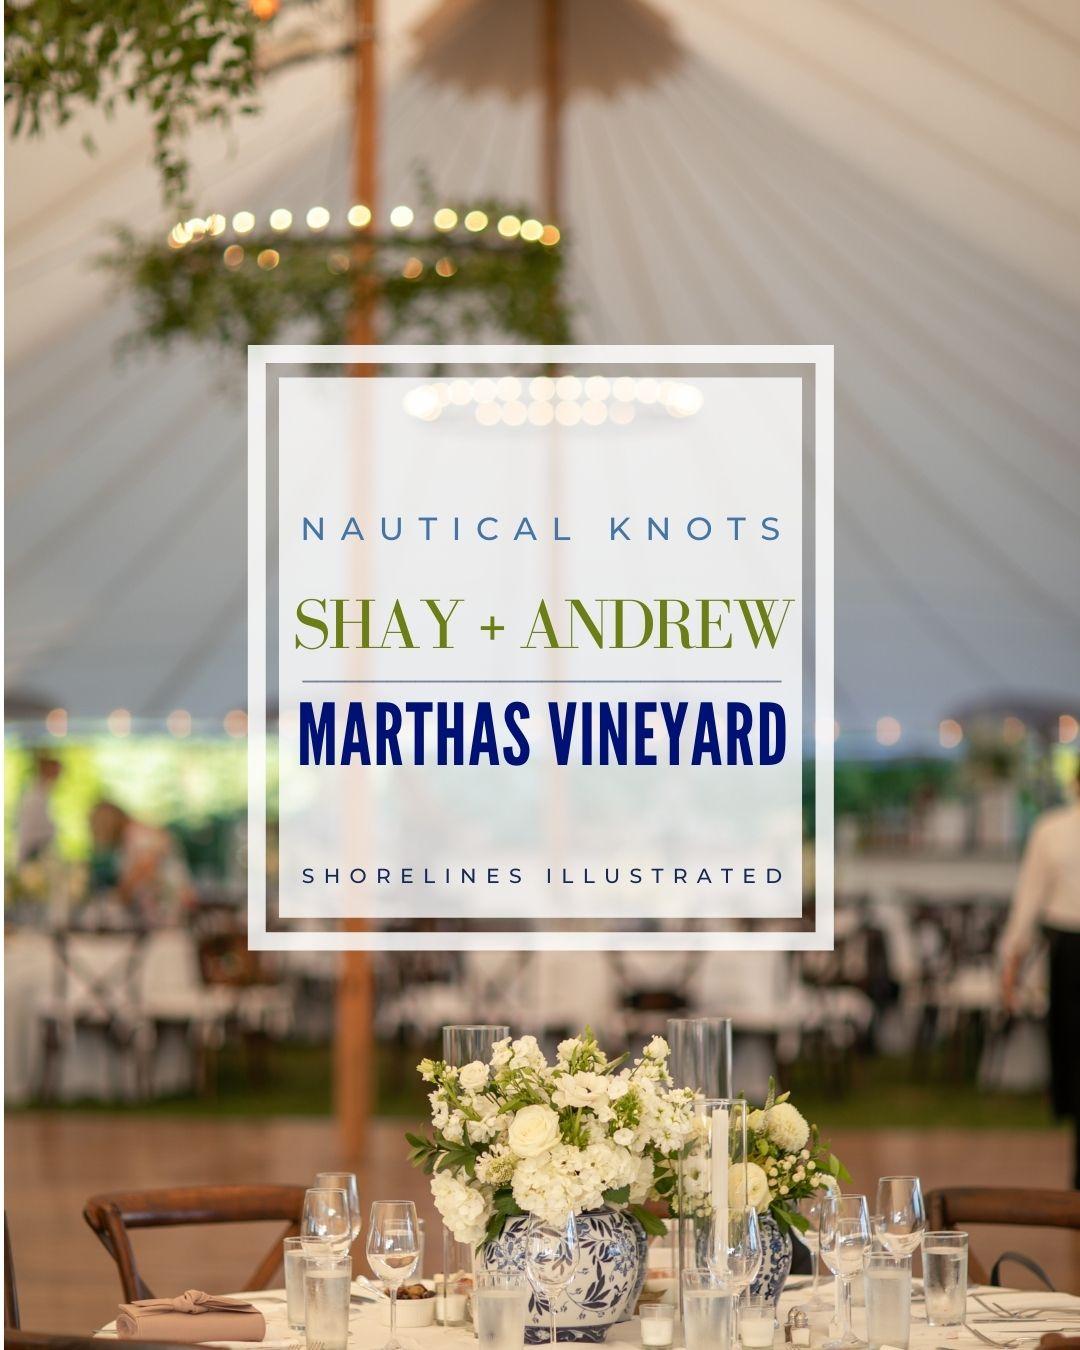 Marthas Vineyard Fall Wedding Shay and Andrew GALLERY-1